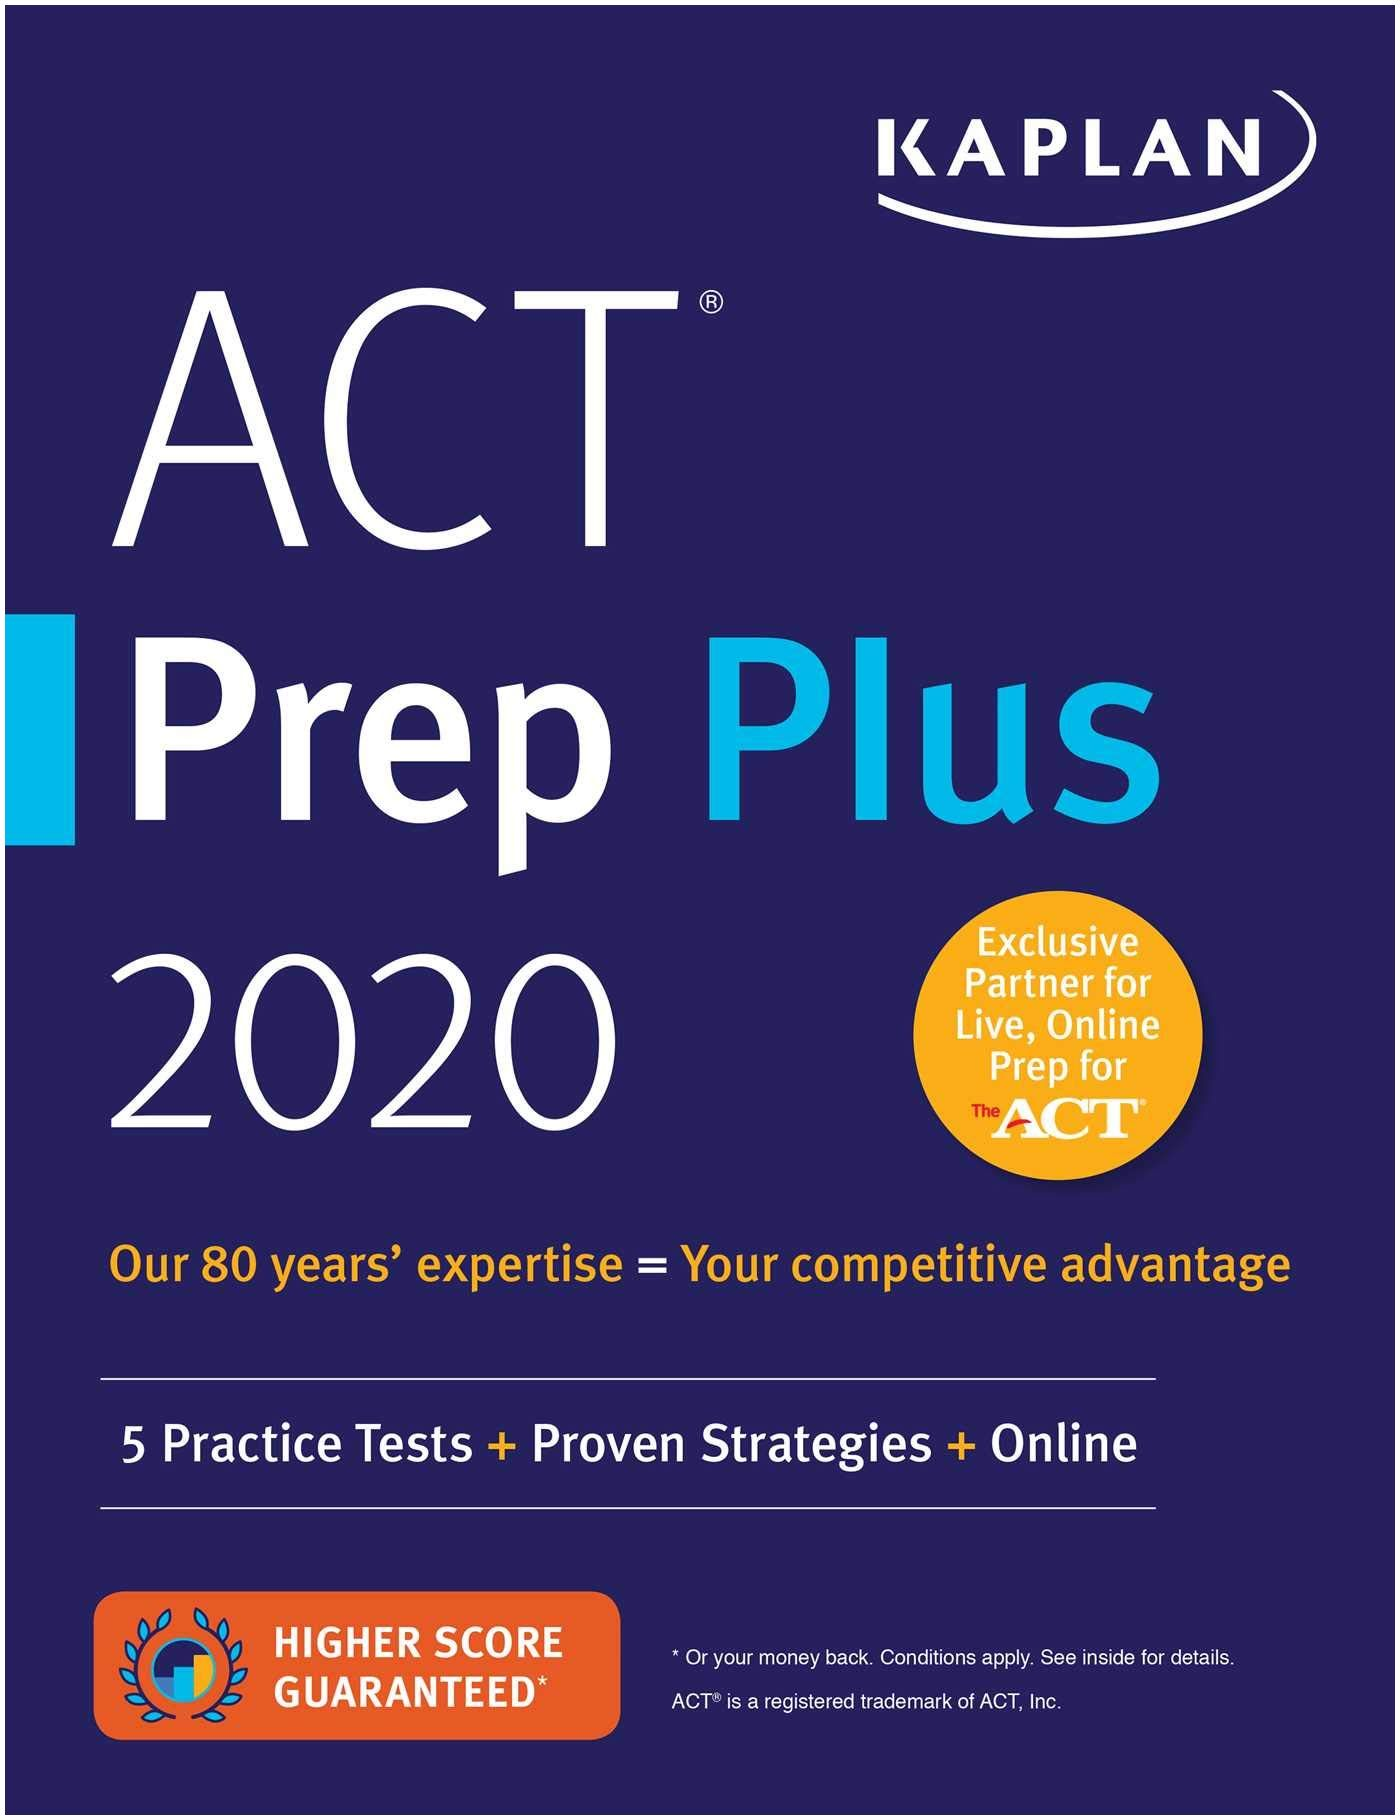 Best Act Prep Book 2019 Amazon Act Prep Plus 2020 5 Practice Tests Proven Strategies